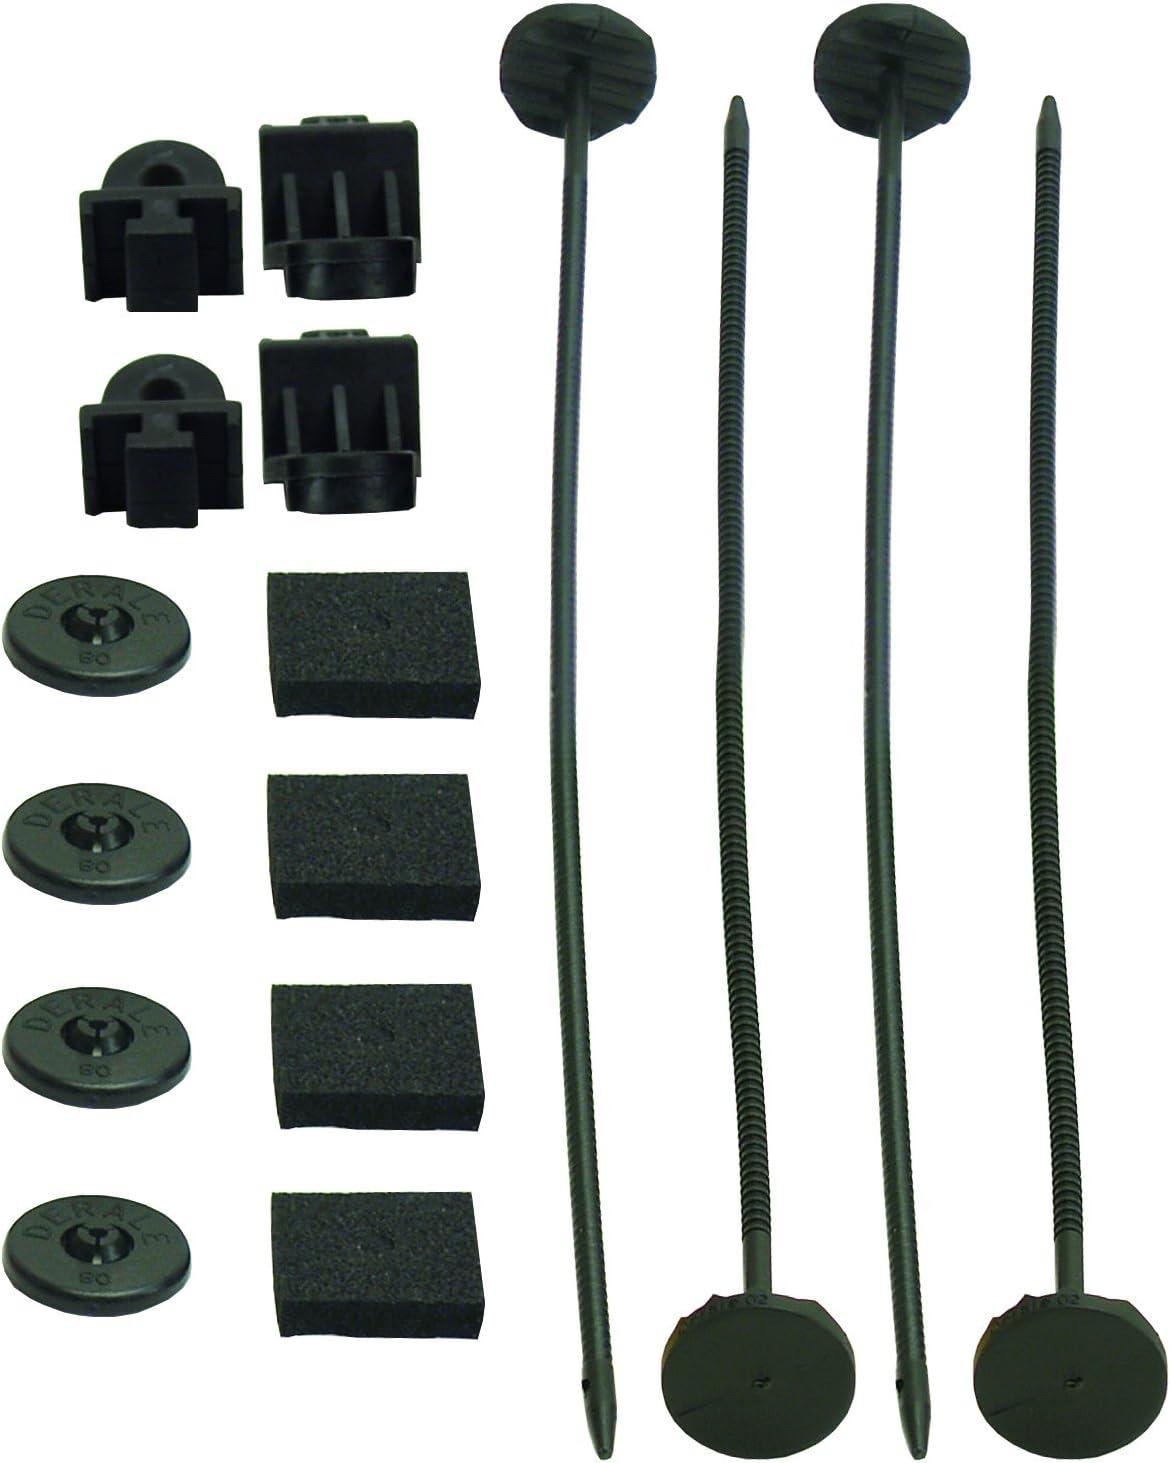 Derale 16744 Plastic Rod Mounting mart Kit Free shipping New Black